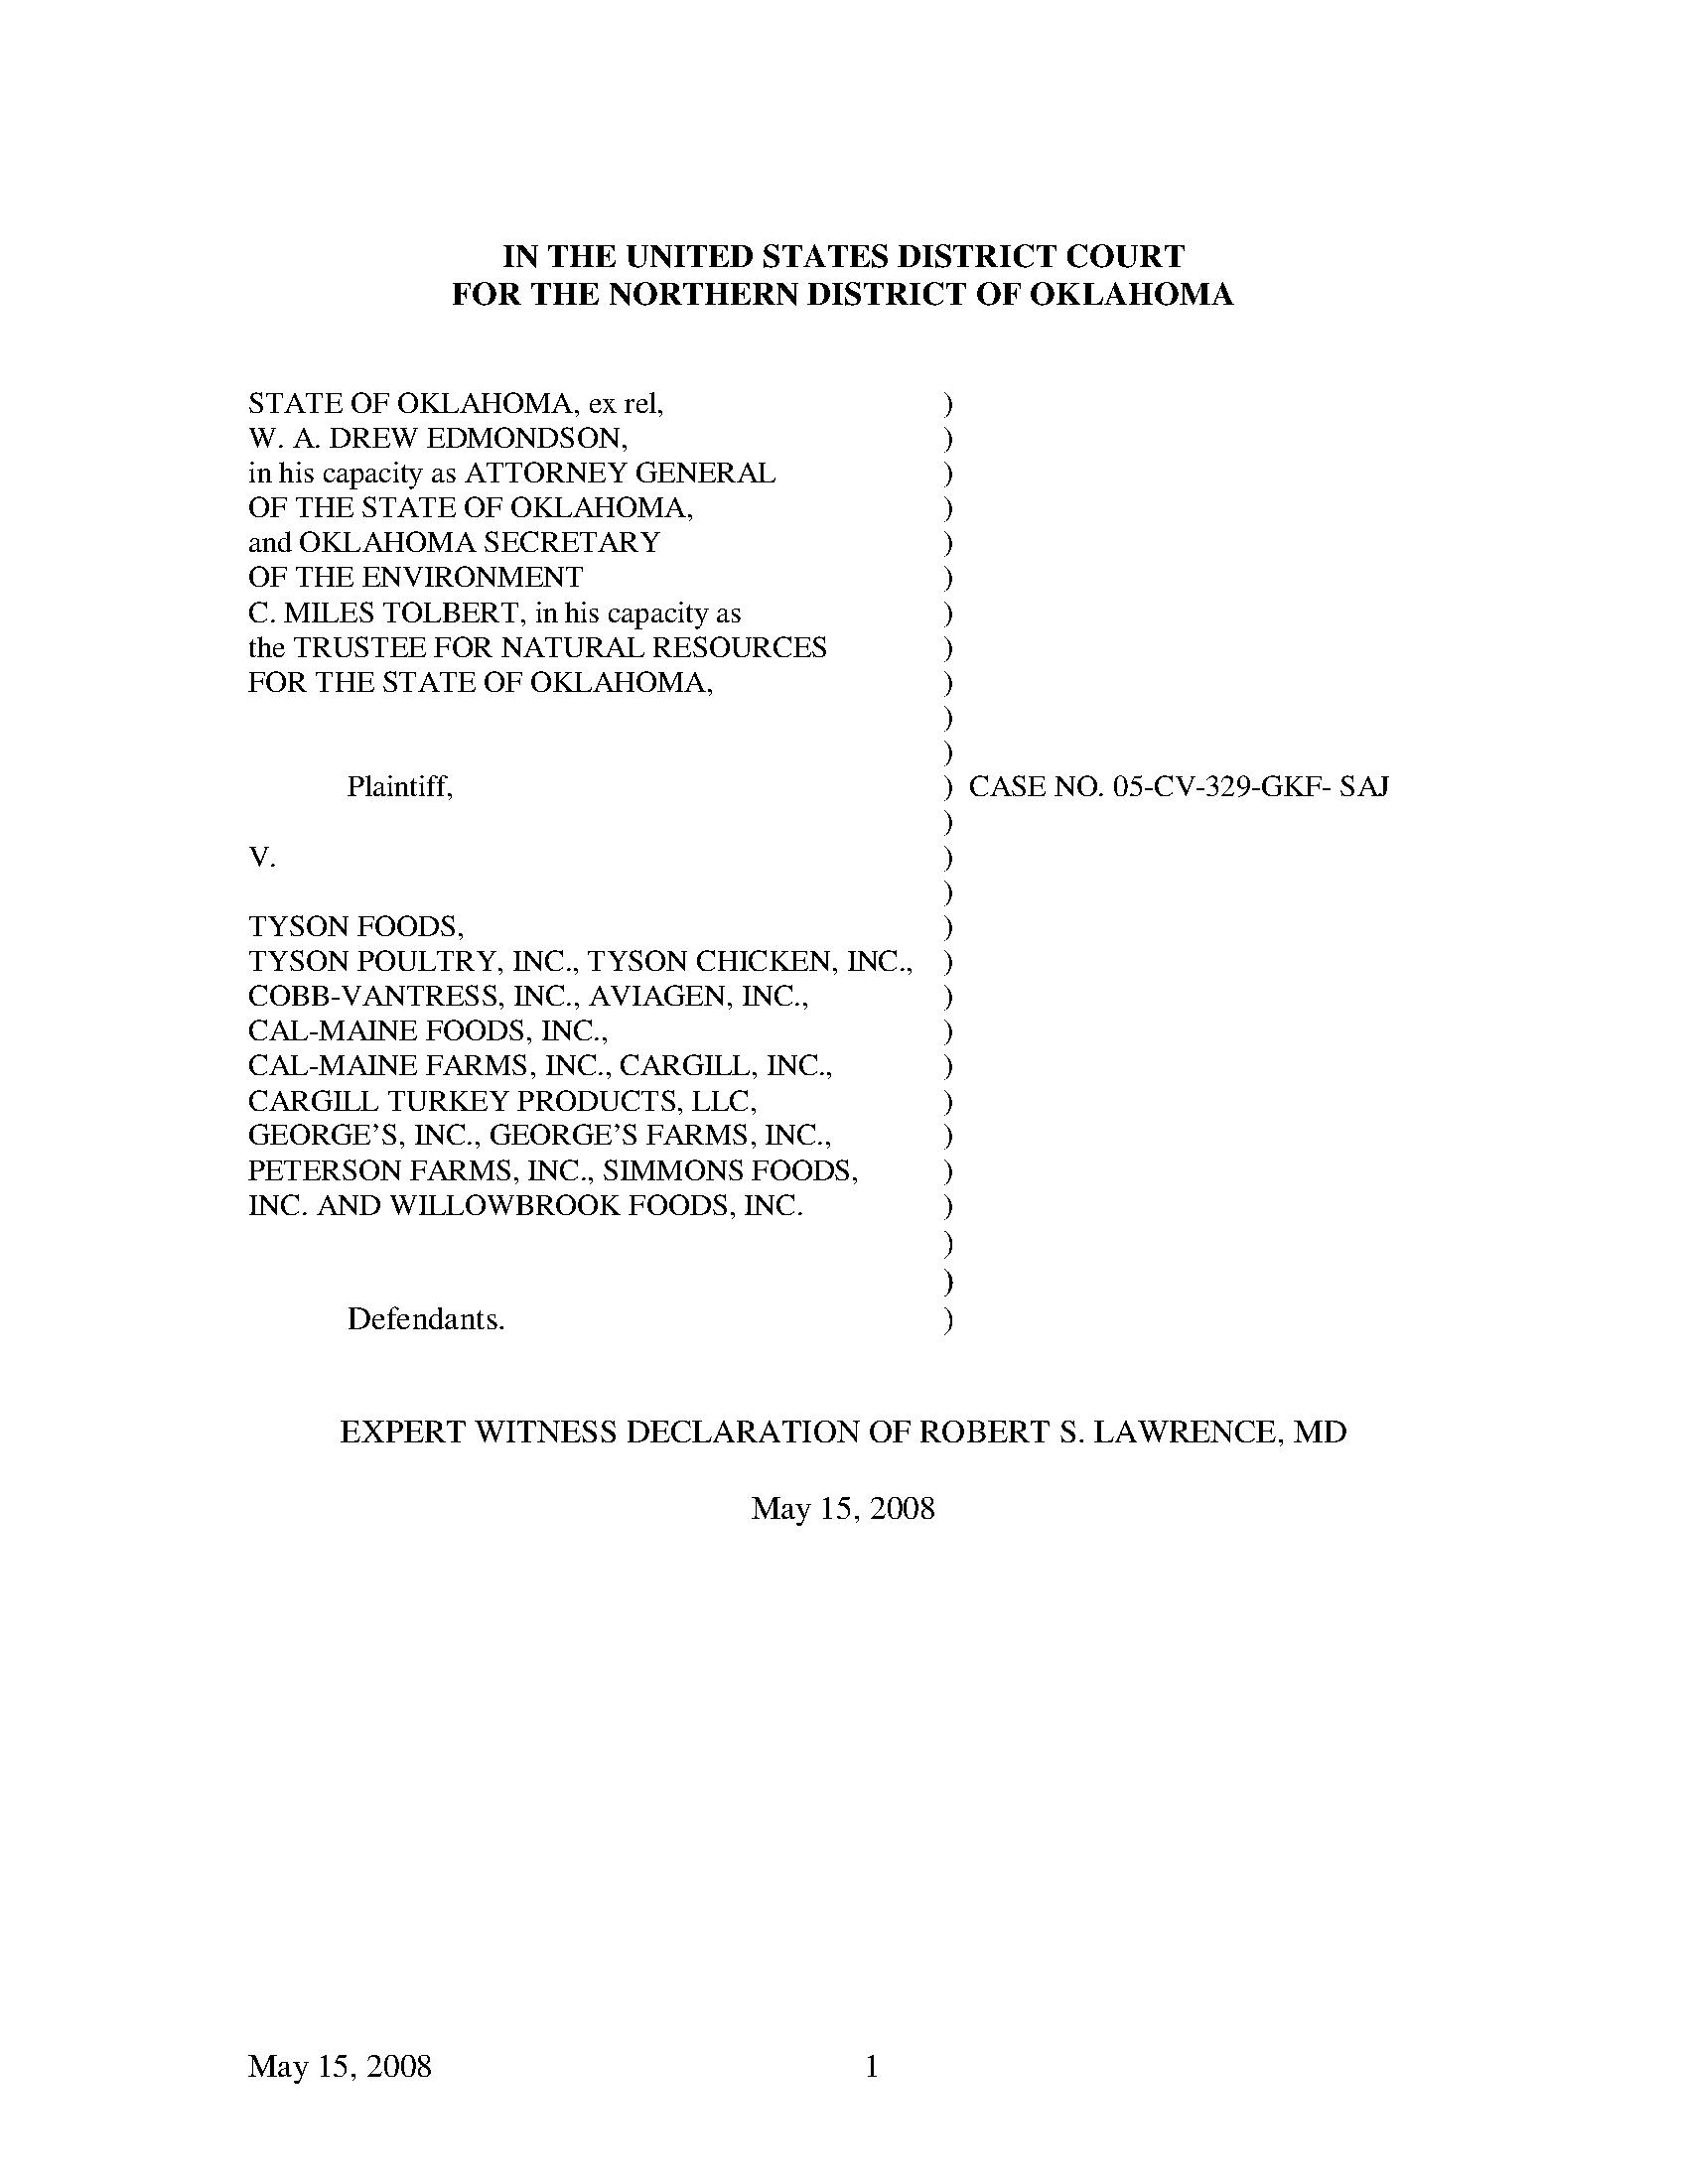 OK Attorney General - Lawrence File 1 - Documents OK Gov - Oklahoma